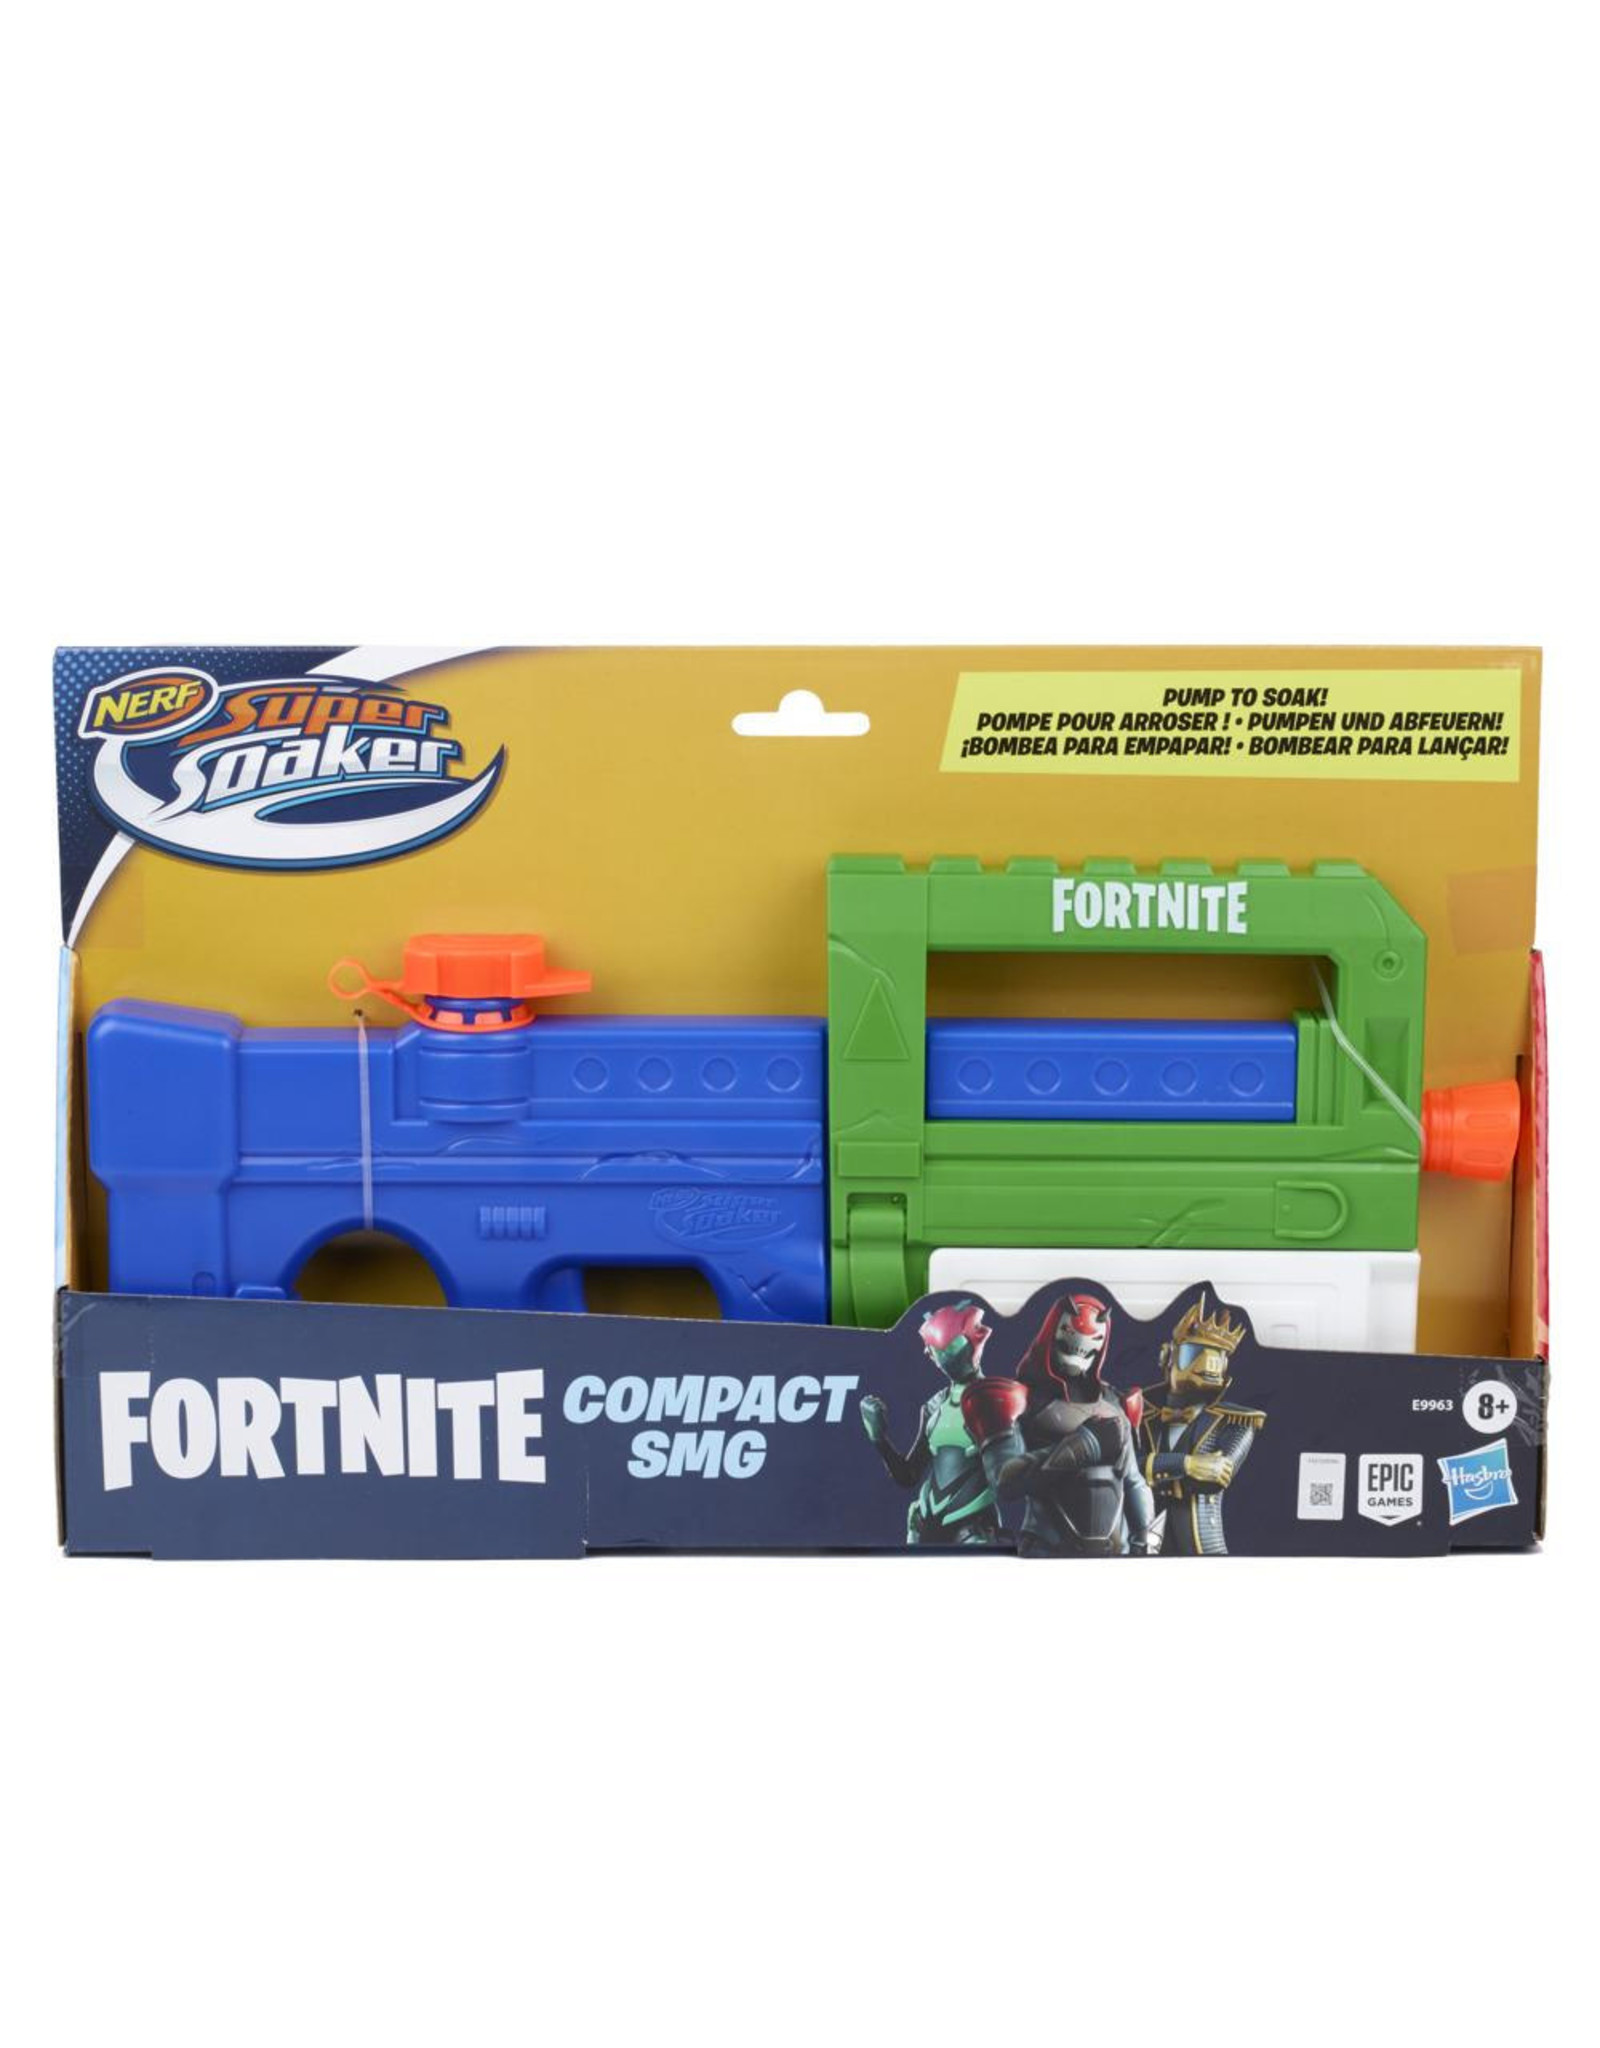 Hasbro Nerf: Super Soaker Fortnite - Compact SMG Water Blaster